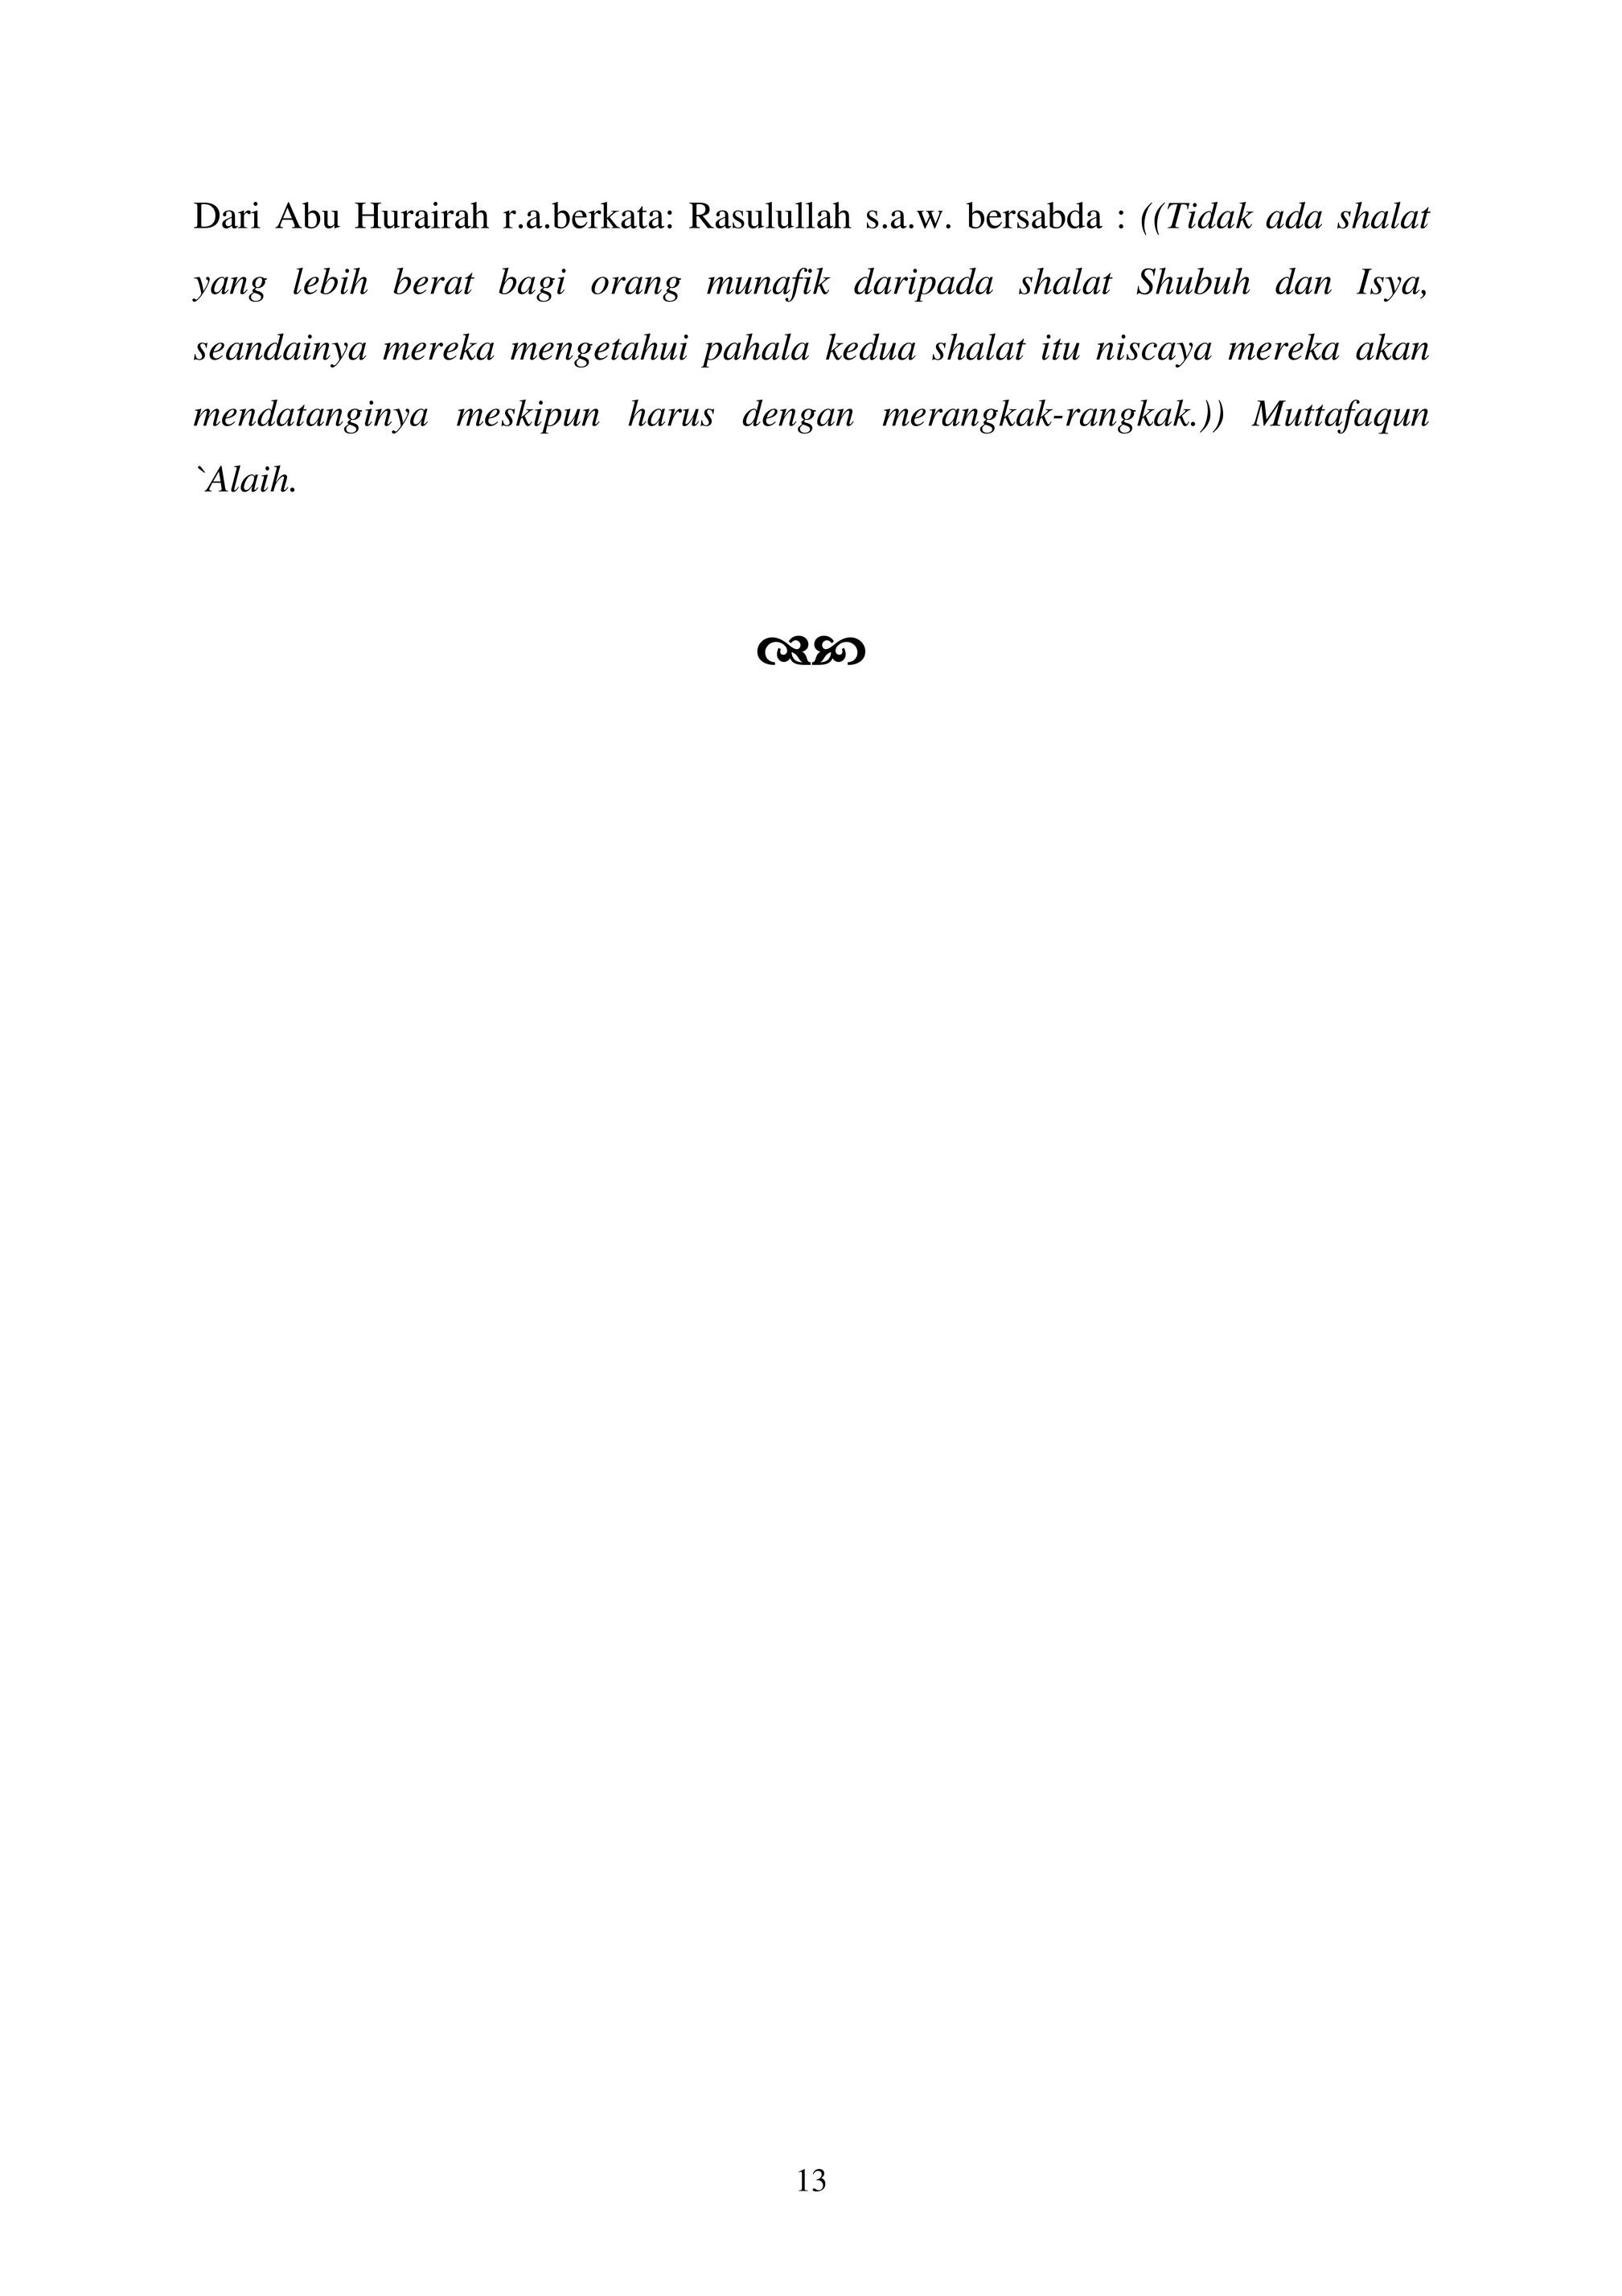 Arti Muttafaqun Alaih : muttafaqun, alaih, Publications, Virtue, Benefits, Statute, Indonesian), Created, Publitas.com